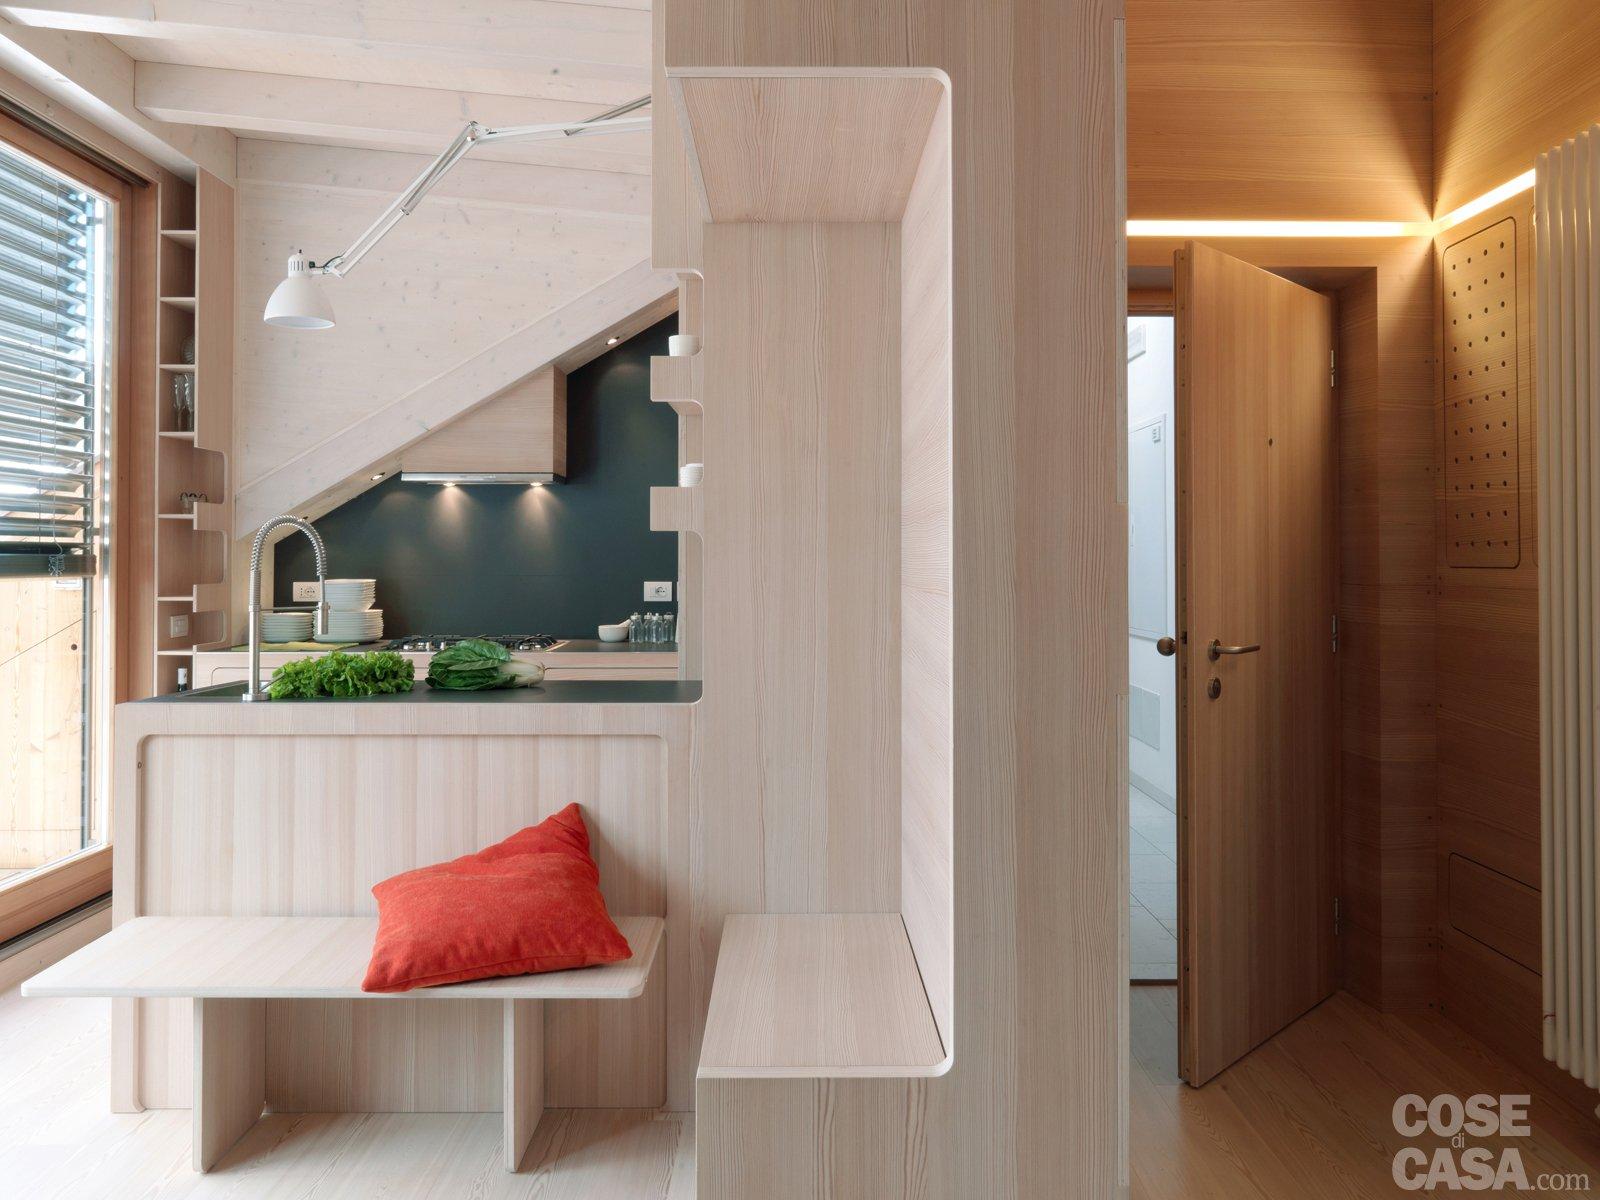 Casa di montagna sfruttata al centimetro cose di casa - Ingressi case moderne ...